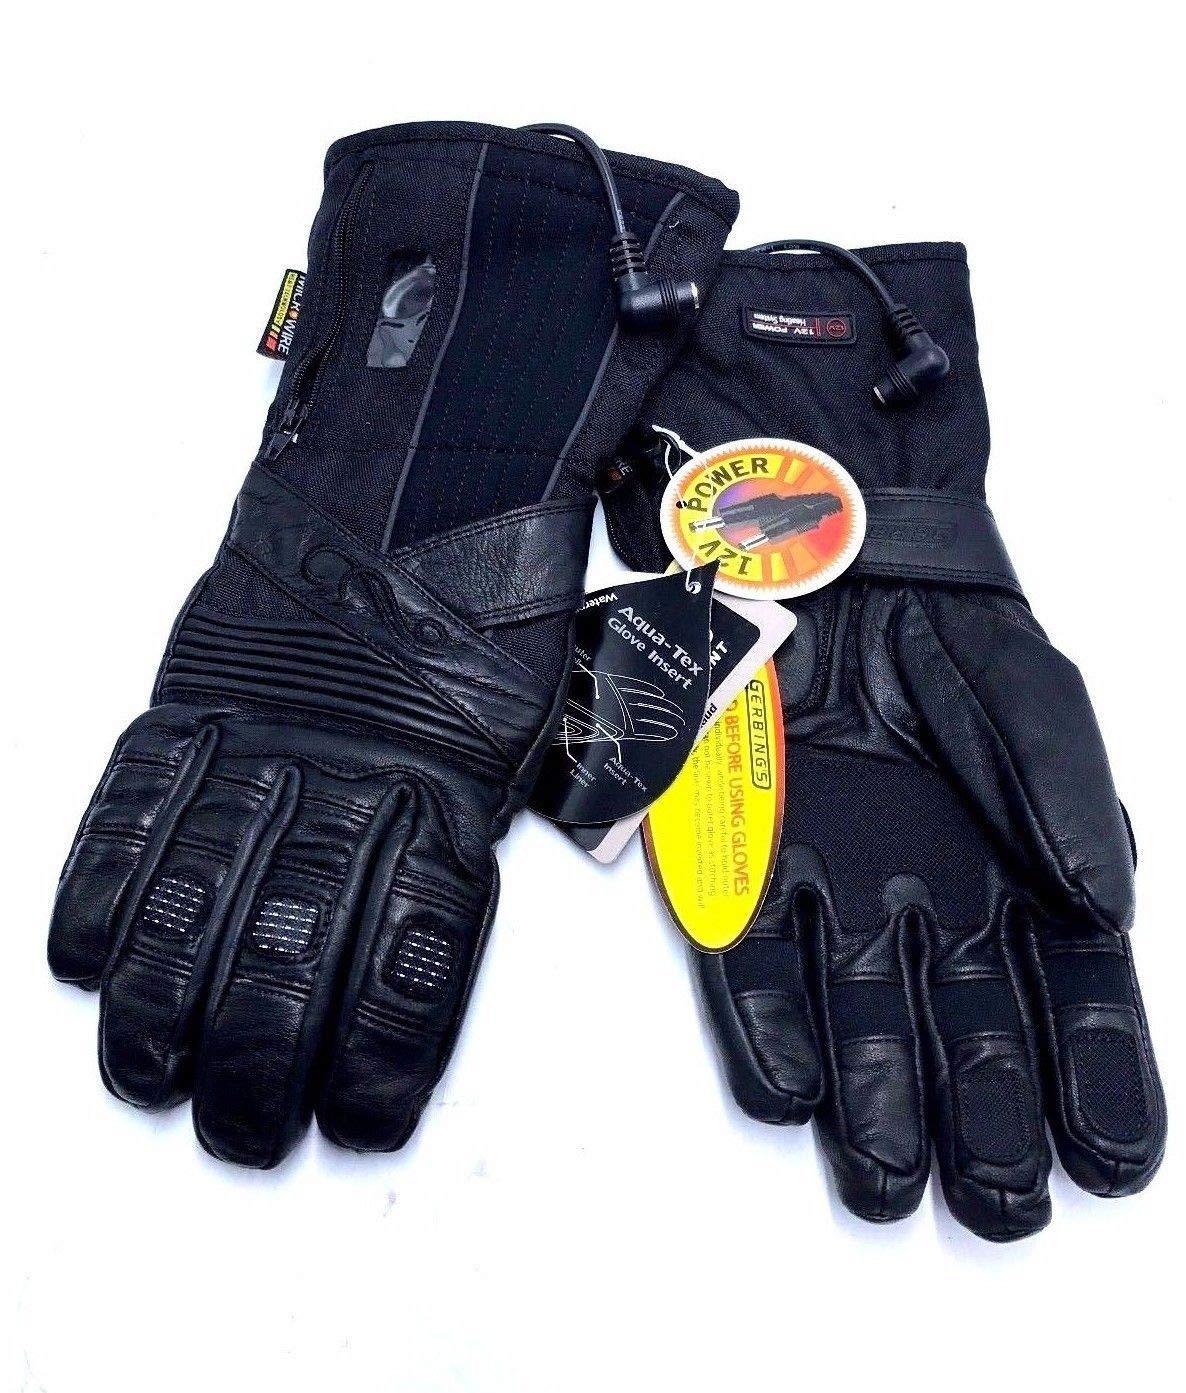 The Best Heated Gloves To Help Keep You Toasty | TouristSecrets